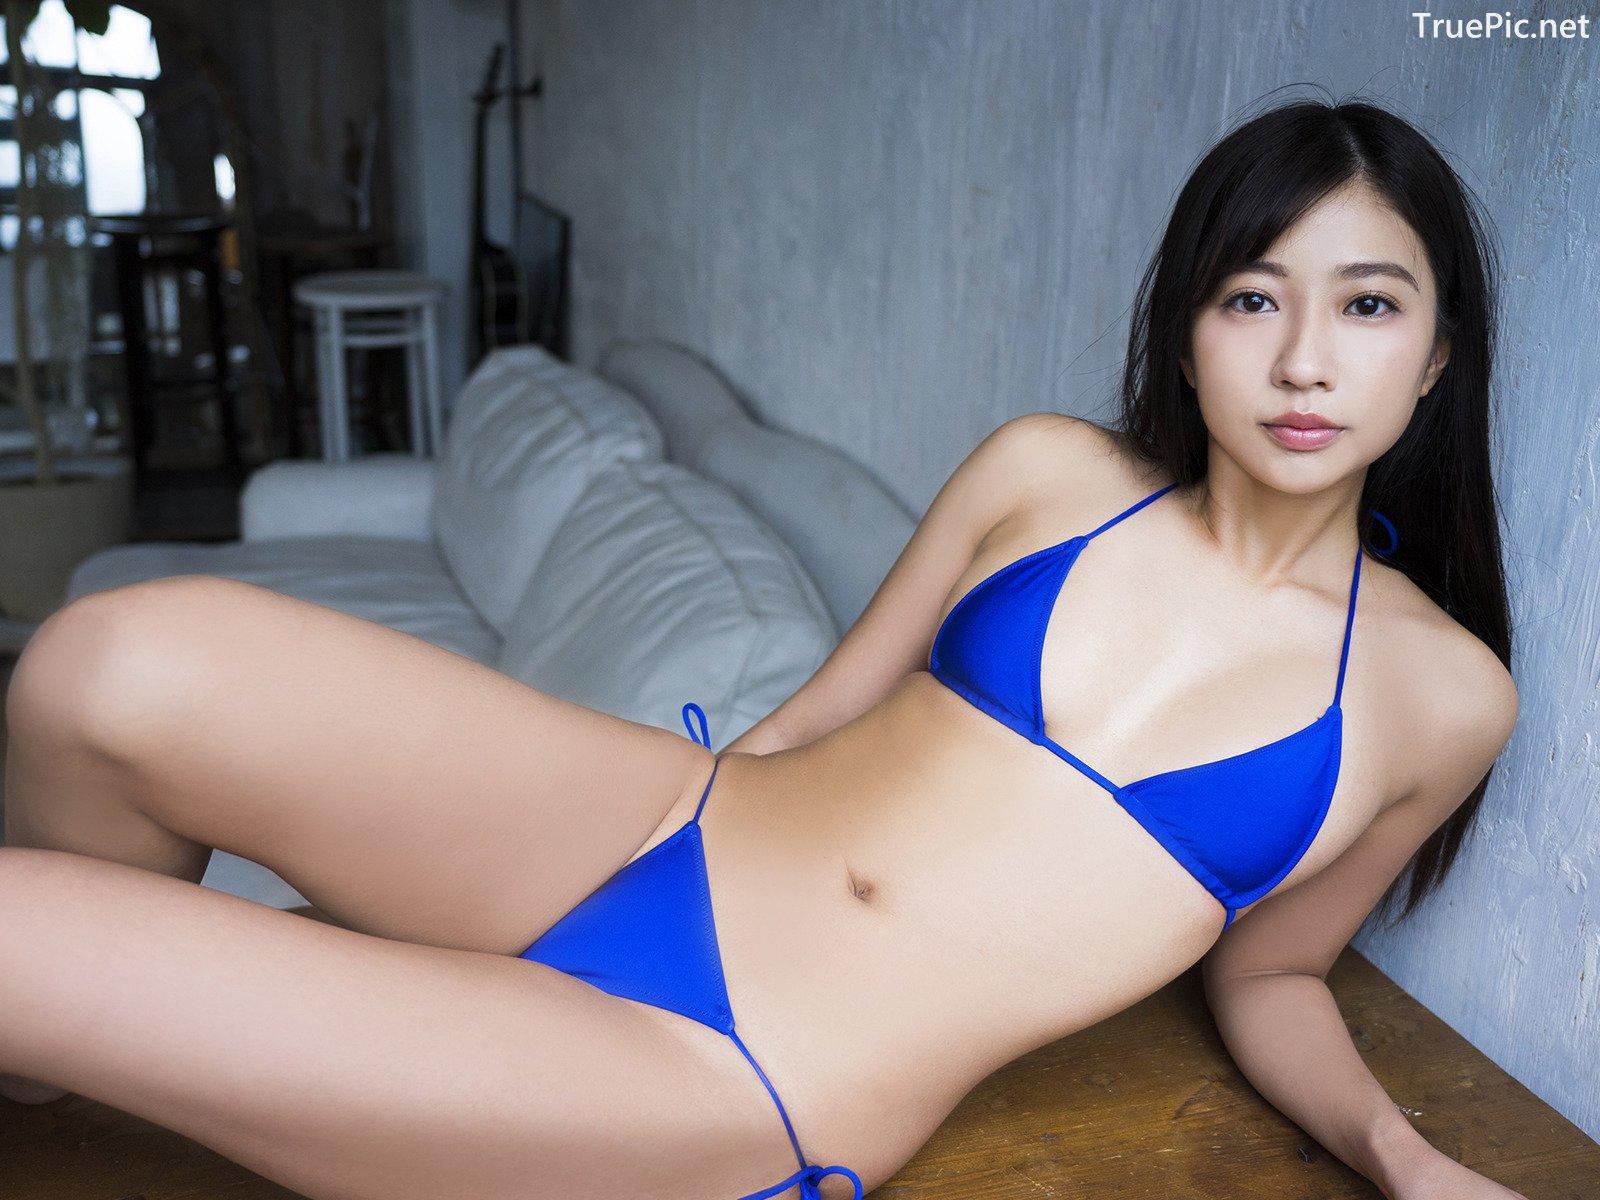 Image Japanese Gravure Model - Sayaka Ohnuki - Maiden Love Story - TruePic.net - Picture-40